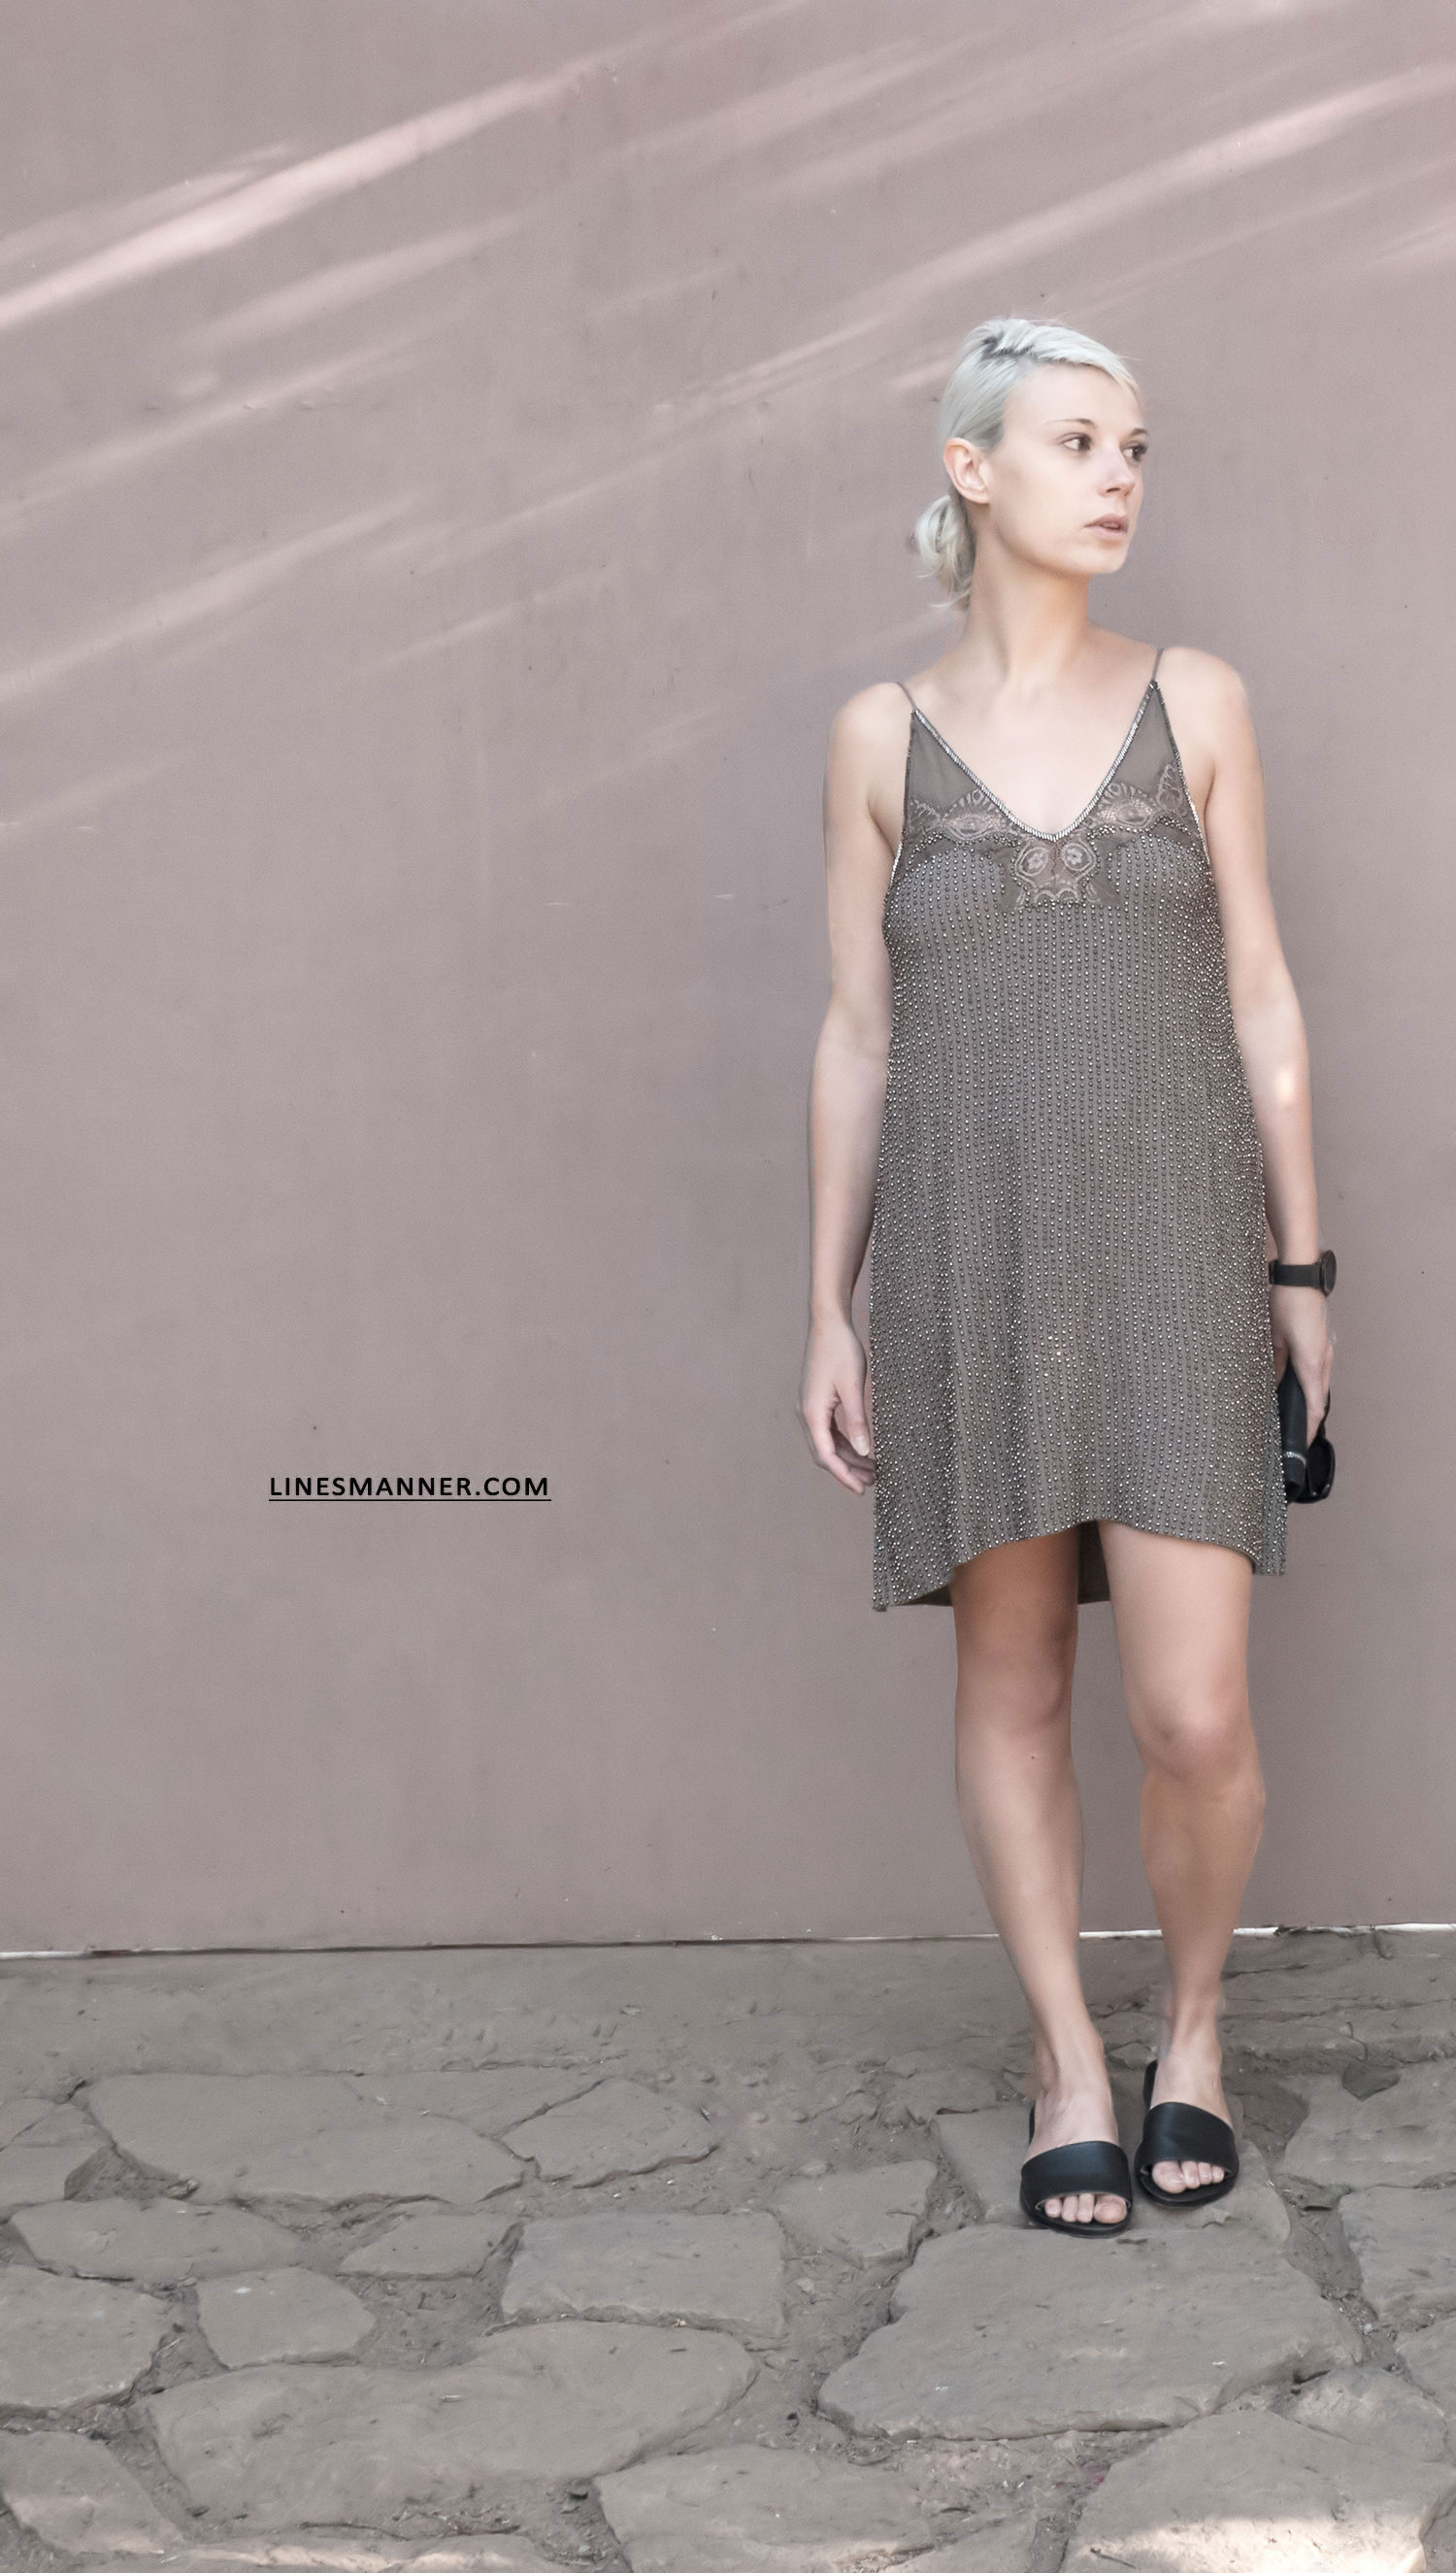 Lines-Manner-Magali_Pascal-Boheme-Chic-Minimalist-Bare_Minimal-Essential-Effortless-Details-Organic-Luxurious-Silk-Dress-Lace-11